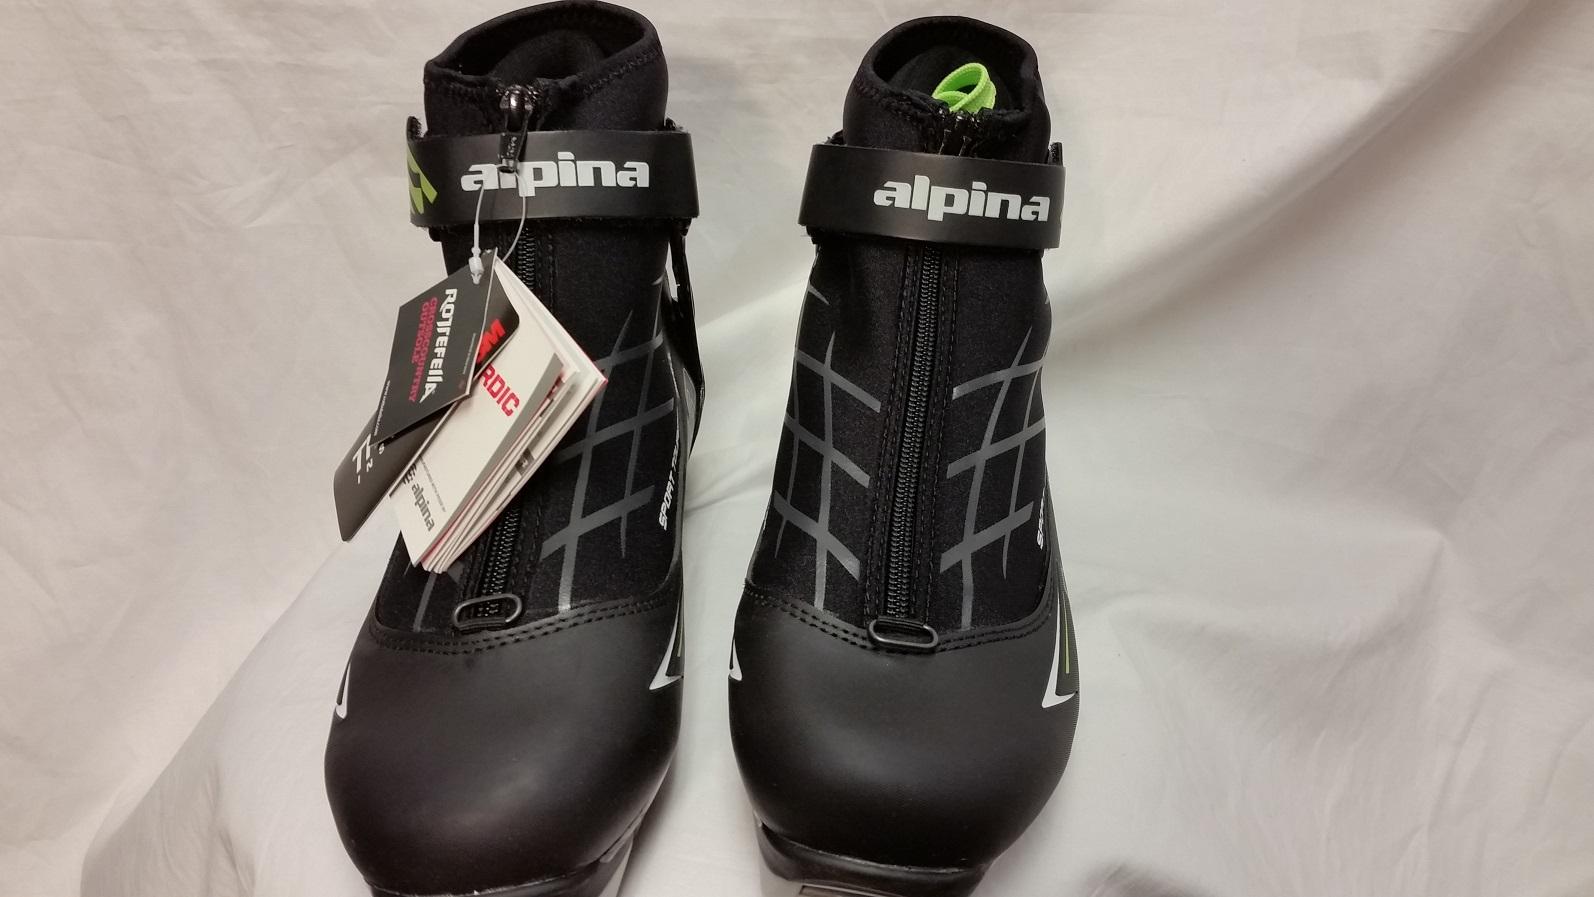 Alpina T Plus Nordic Ski Boots NNN CLOSEOUT Moab Gear Trader - Alpina nordic boots